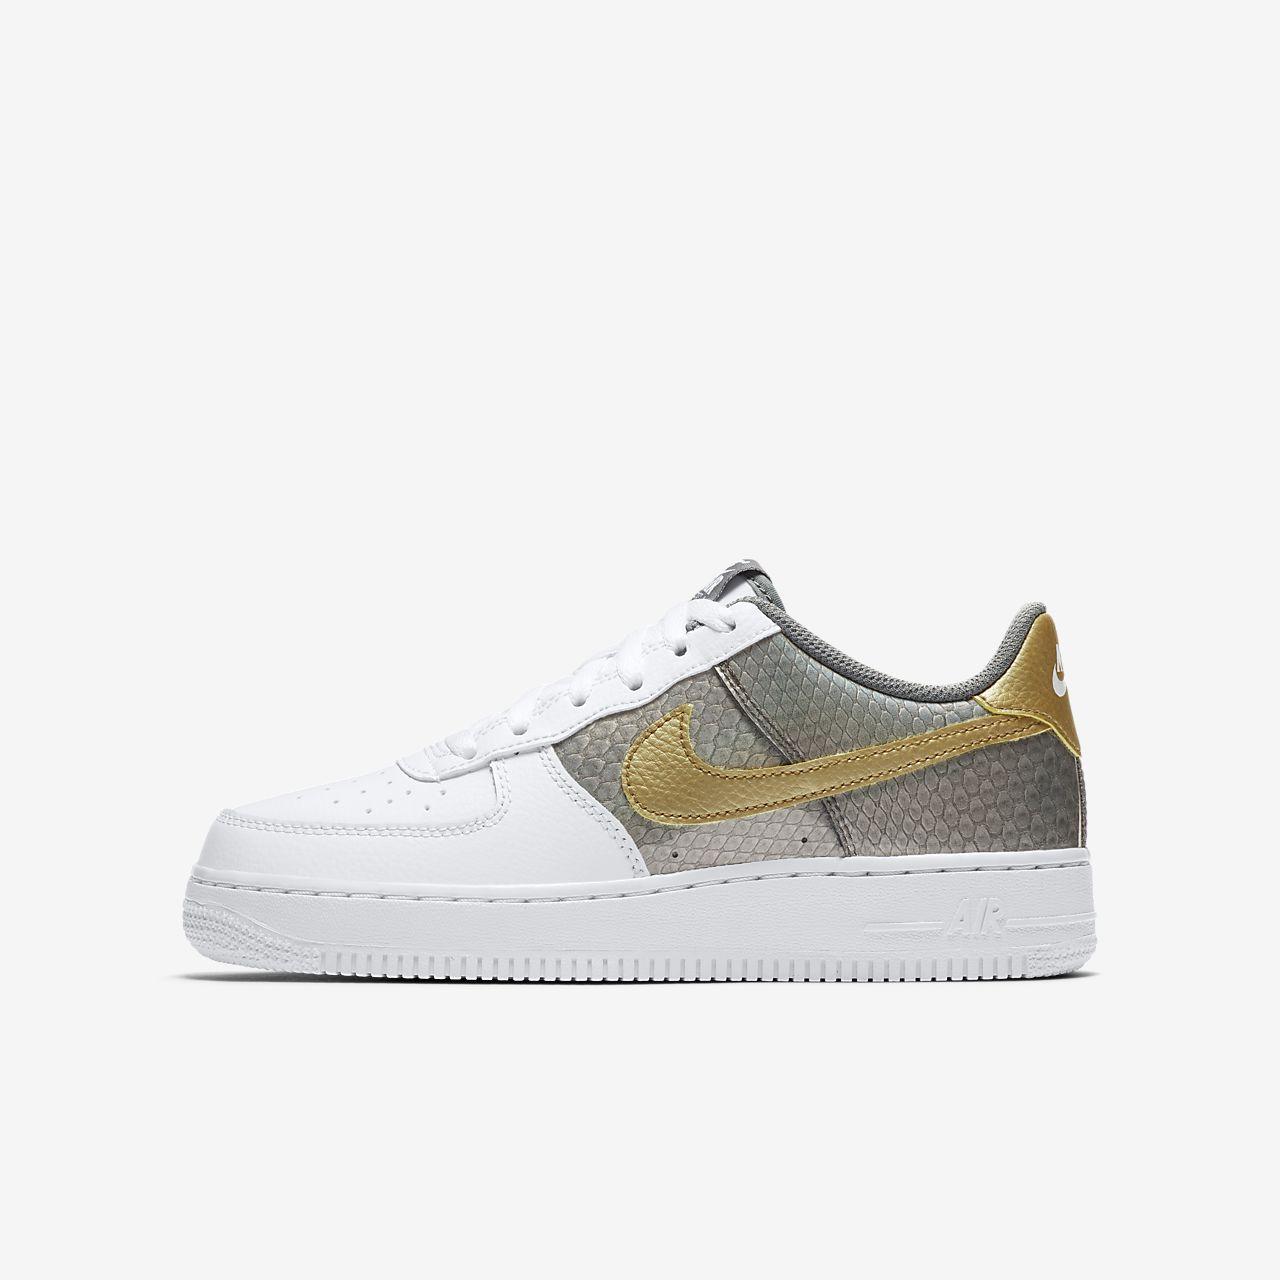 Nike Air Force 1 SE Schuh für ältere Kinder